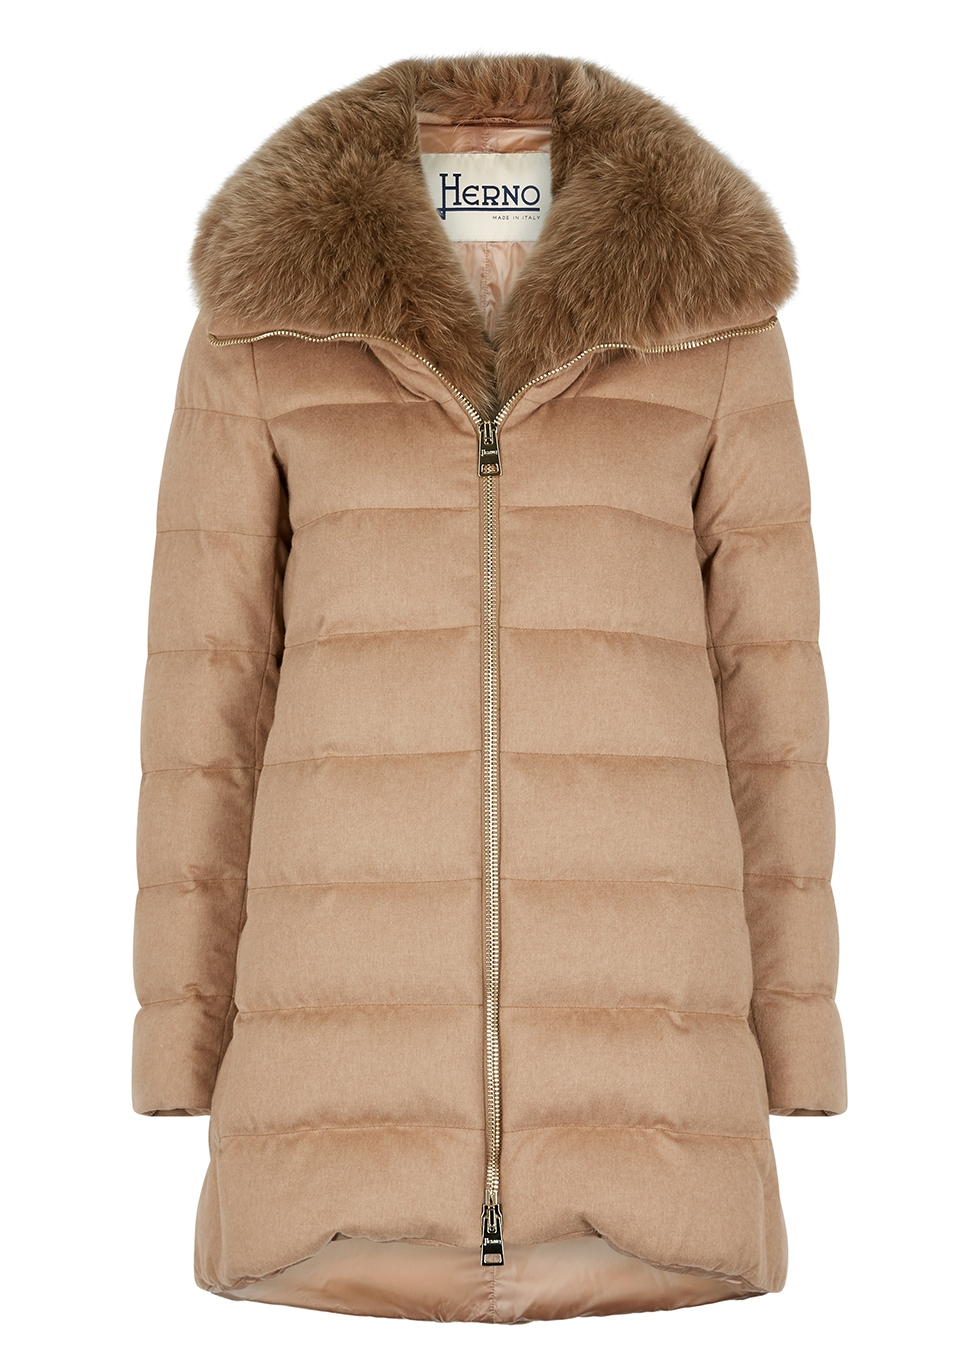 5b53c792f2b Designer Coats - Women's Winter Coats - Harvey Nichols.